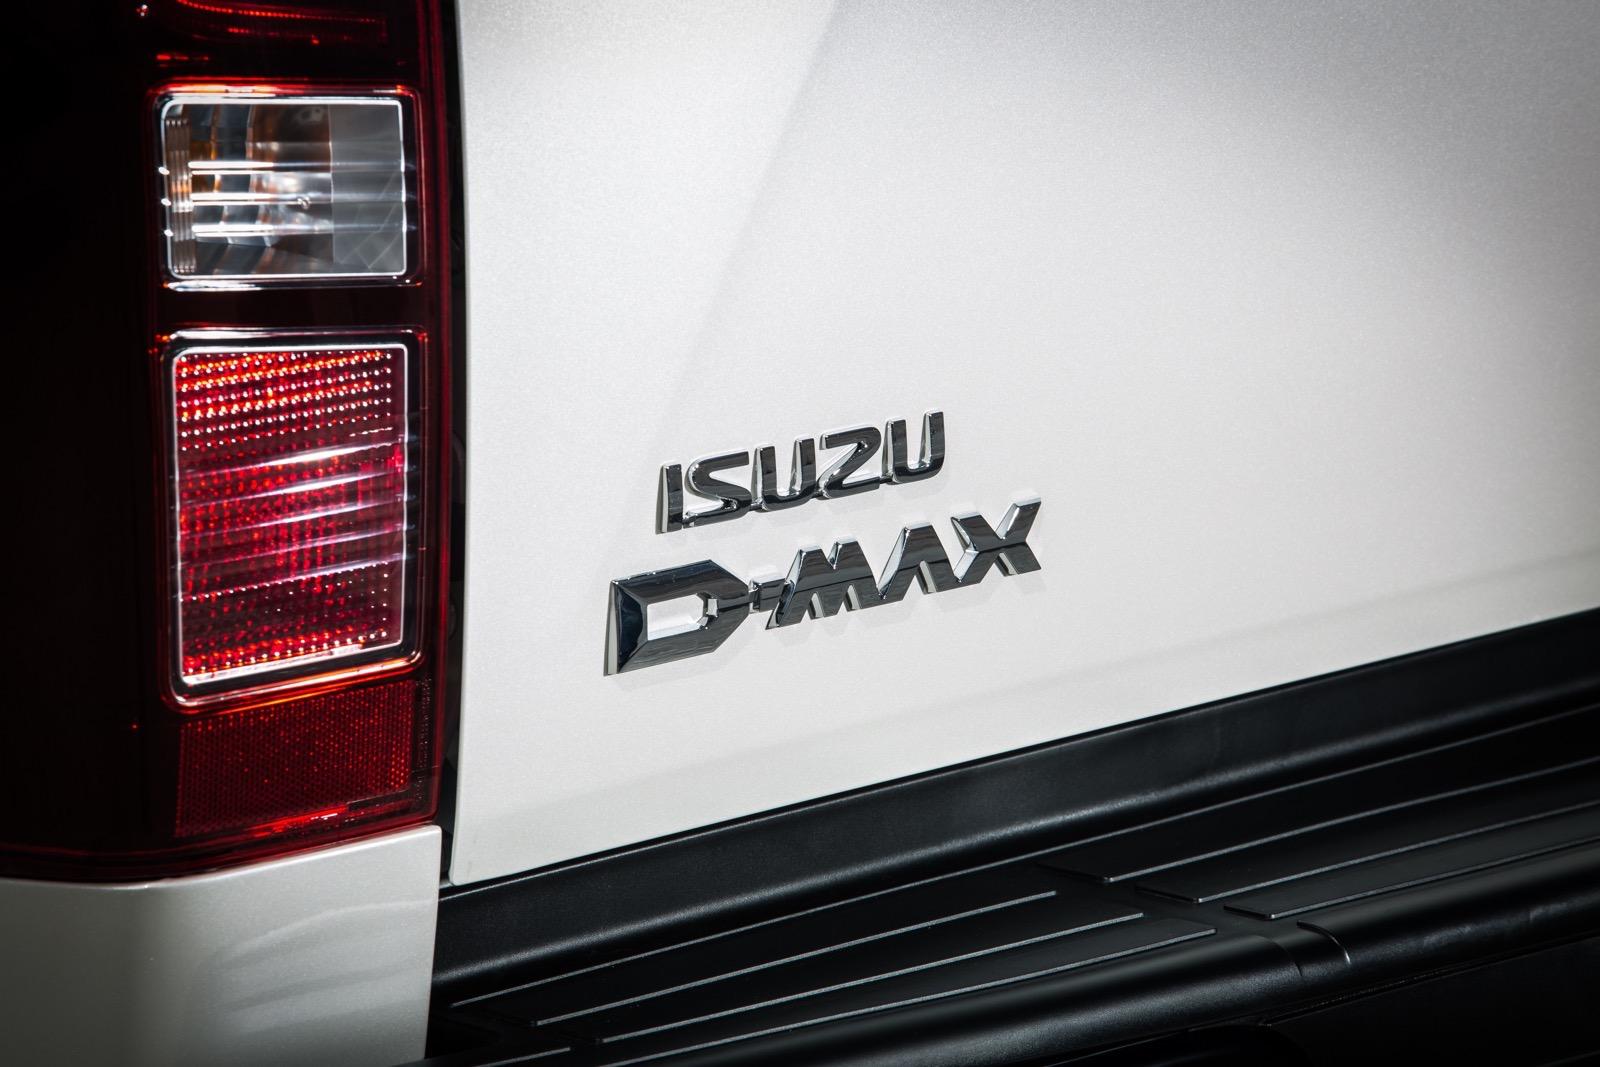 Isuzu_D-Max_83